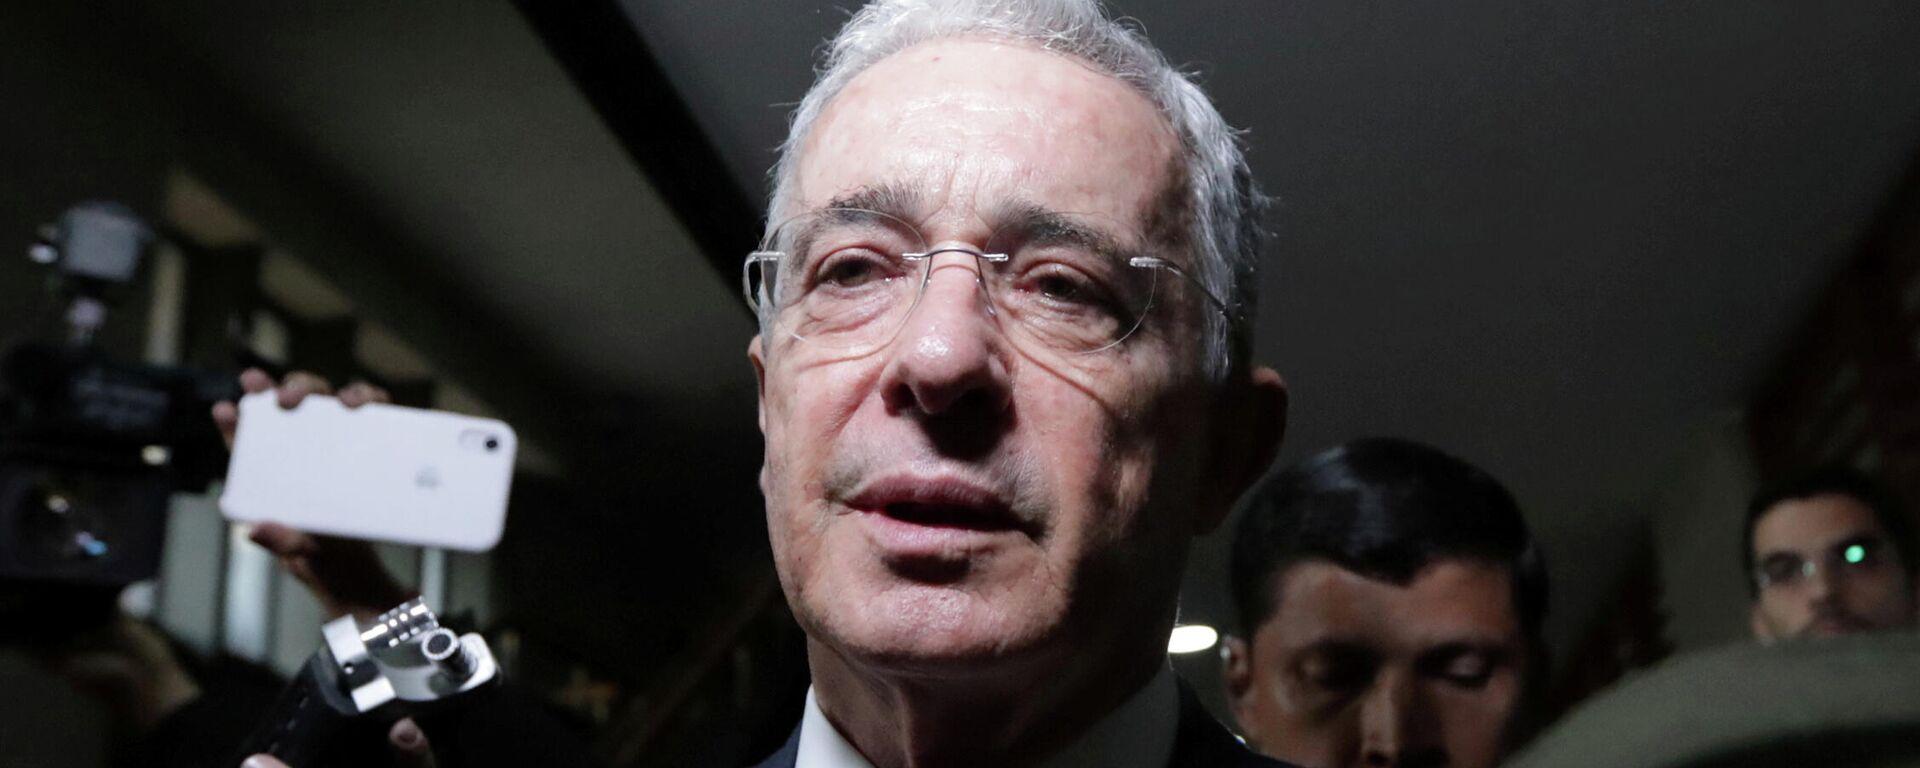 El expresidente colombiano Álvaro Uribe - Sputnik Mundo, 1920, 06.03.2021